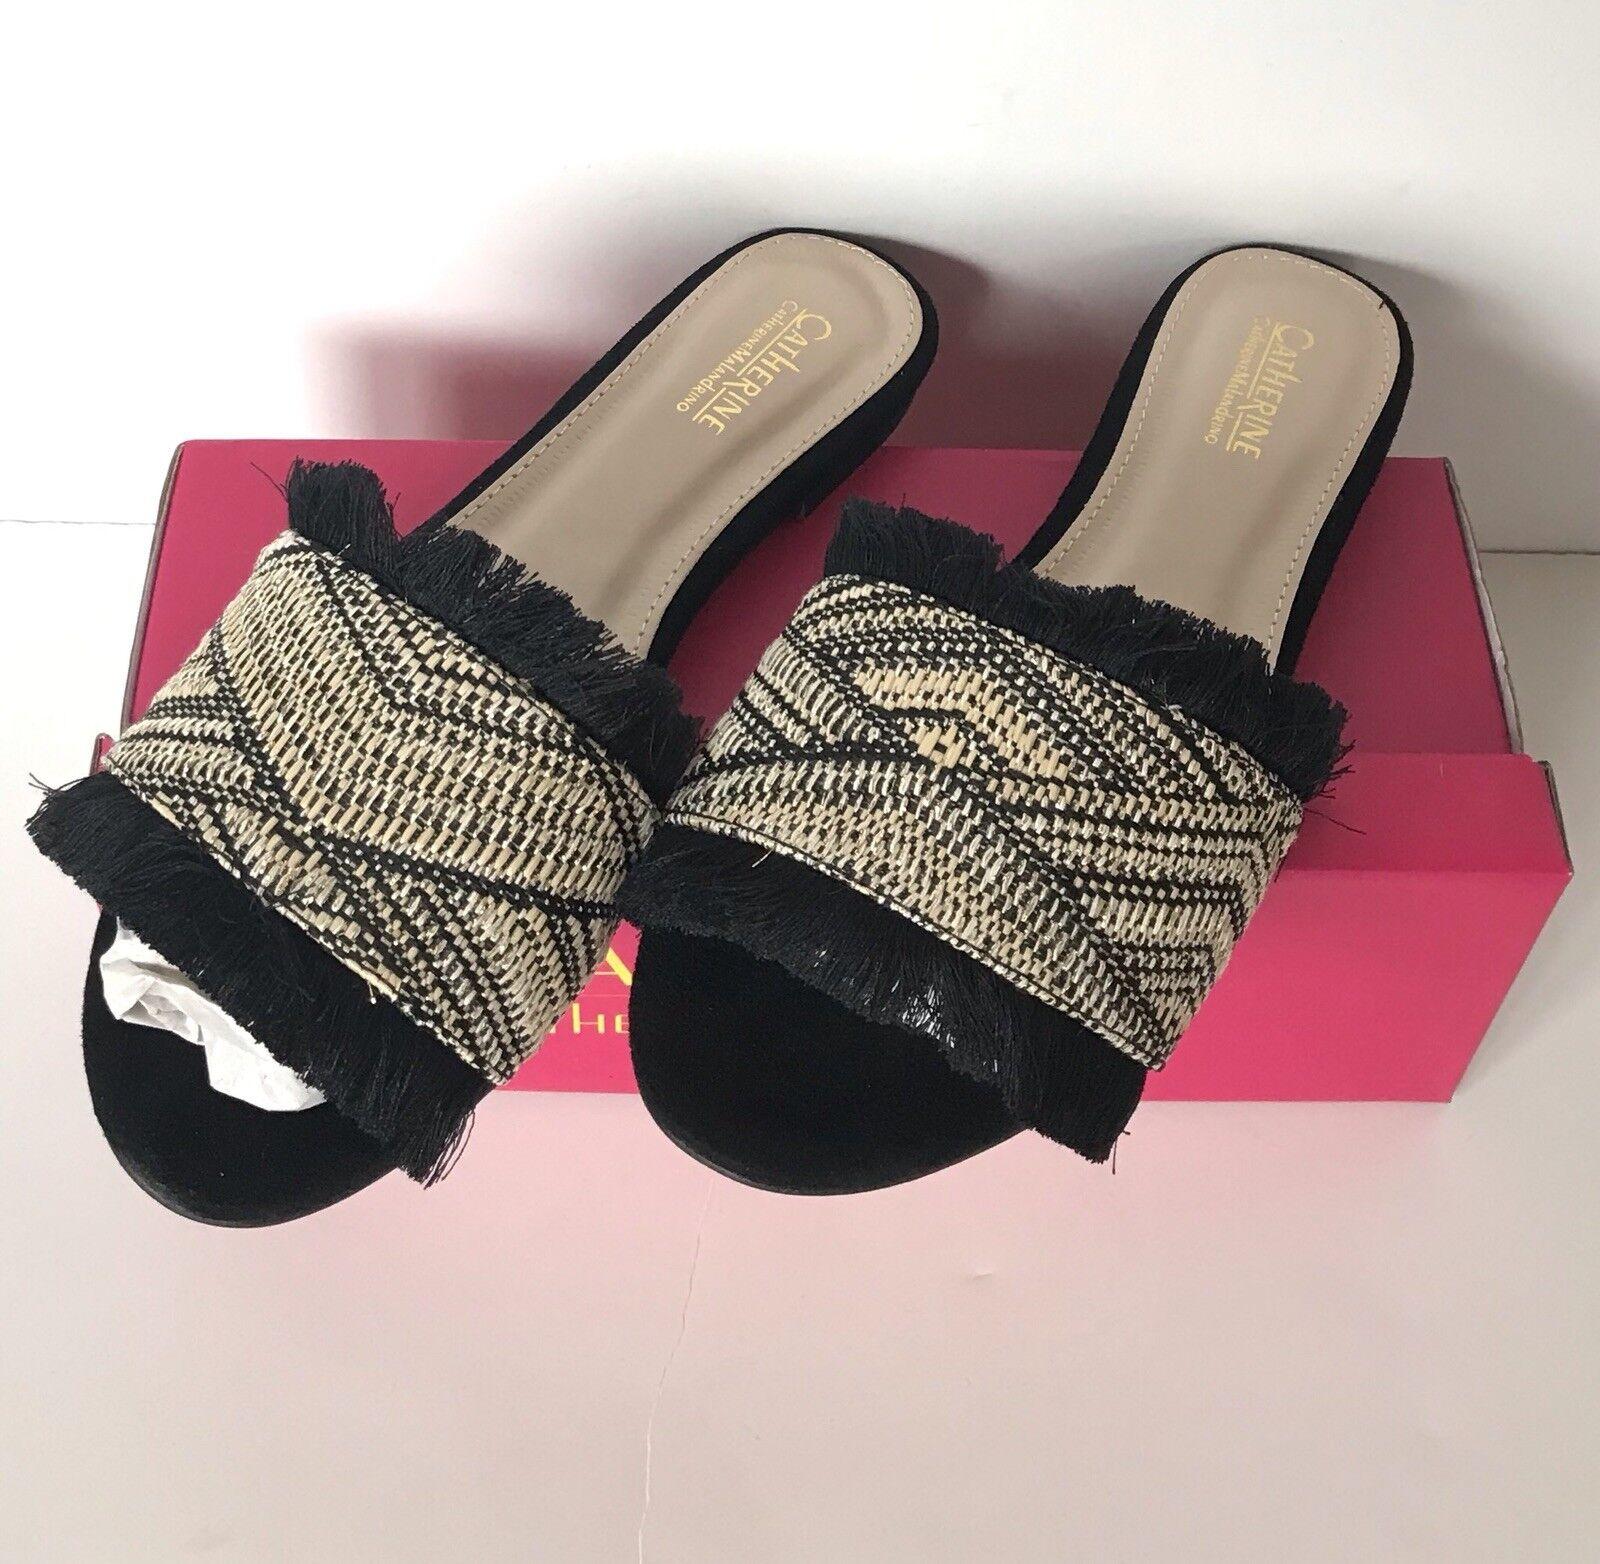 CATHERINE MALANDRINO Reina Black Slide Open Toe Embroidered Fringe Sandals Sz 8